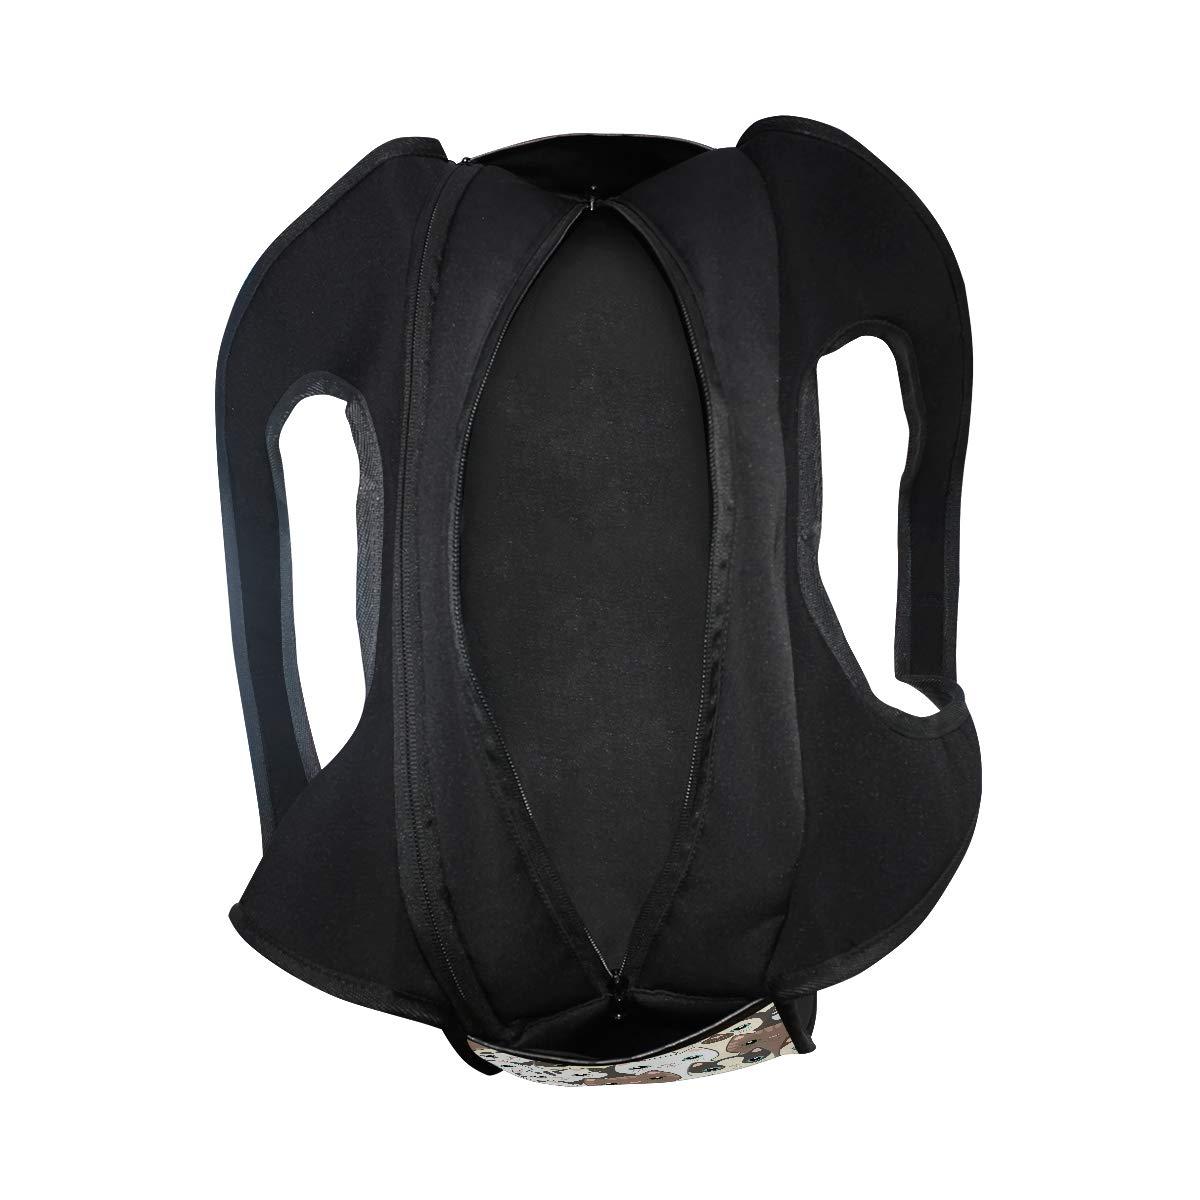 Unisex Travel Duffels Gym Bag Cute Cartoon Cat Canvas Weekender Bag Shoulder Bag Totes bags